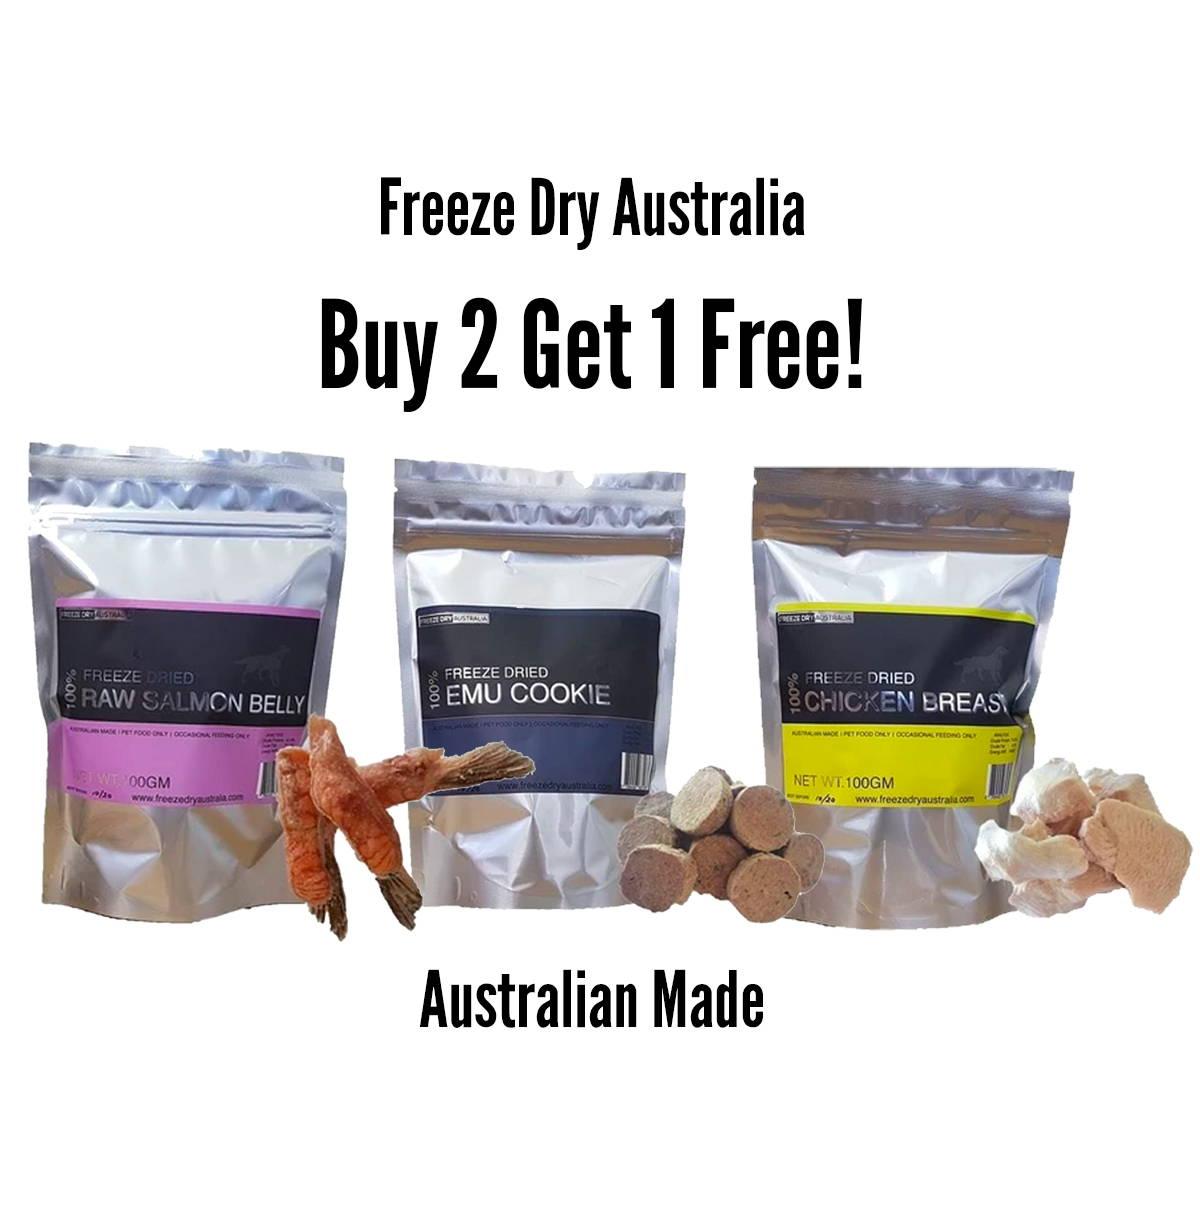 pawpy kisses black friday freeze dry australia promotion